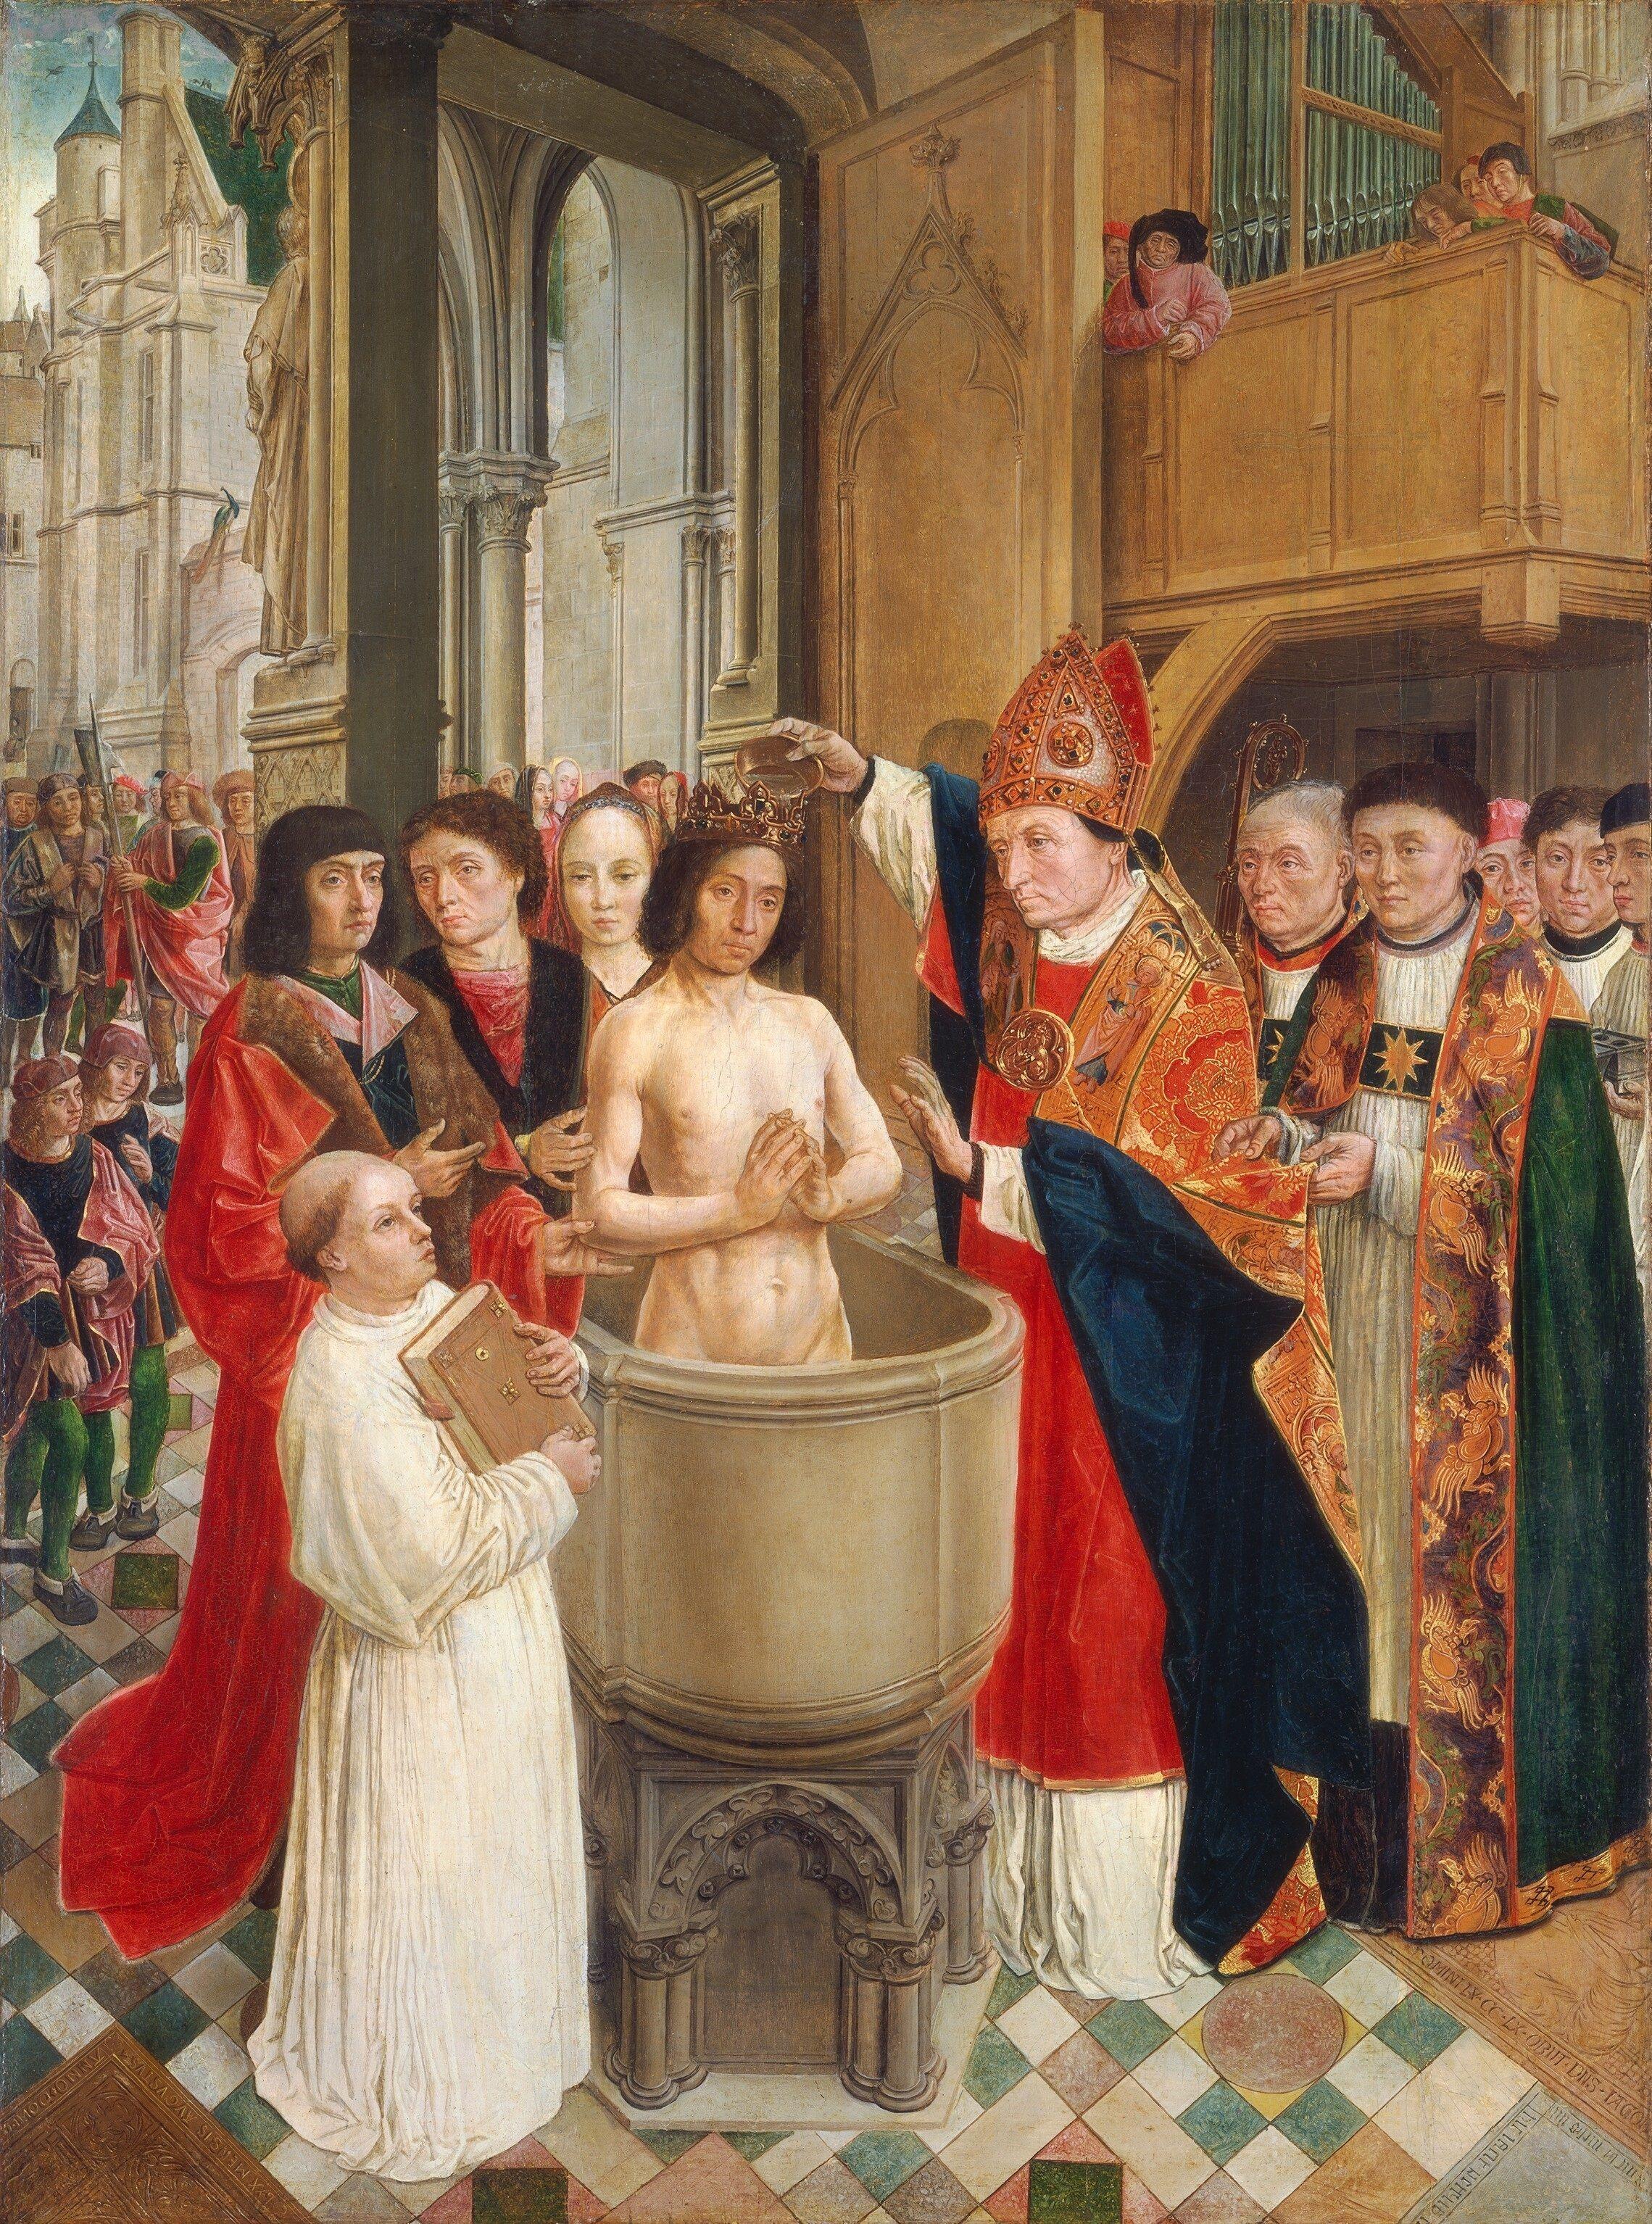 """Batismo de Clóvis"". (by Mestre de Saint Gilles)."